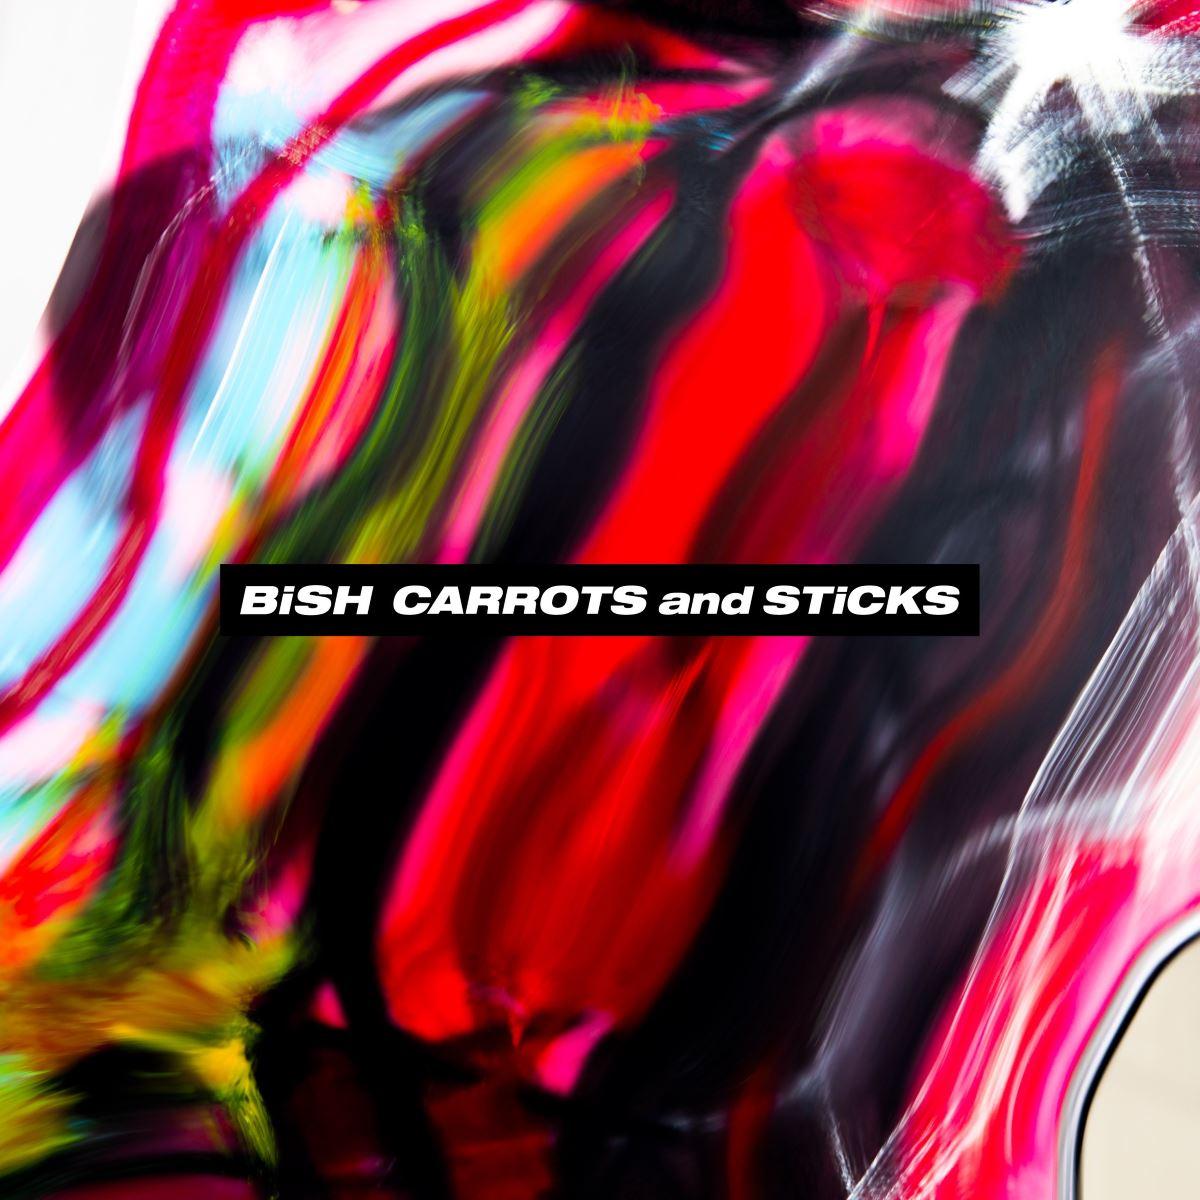 『BiSH - MORE THAN LiKE』収録の『CARROTS and STiCKS』ジャケット